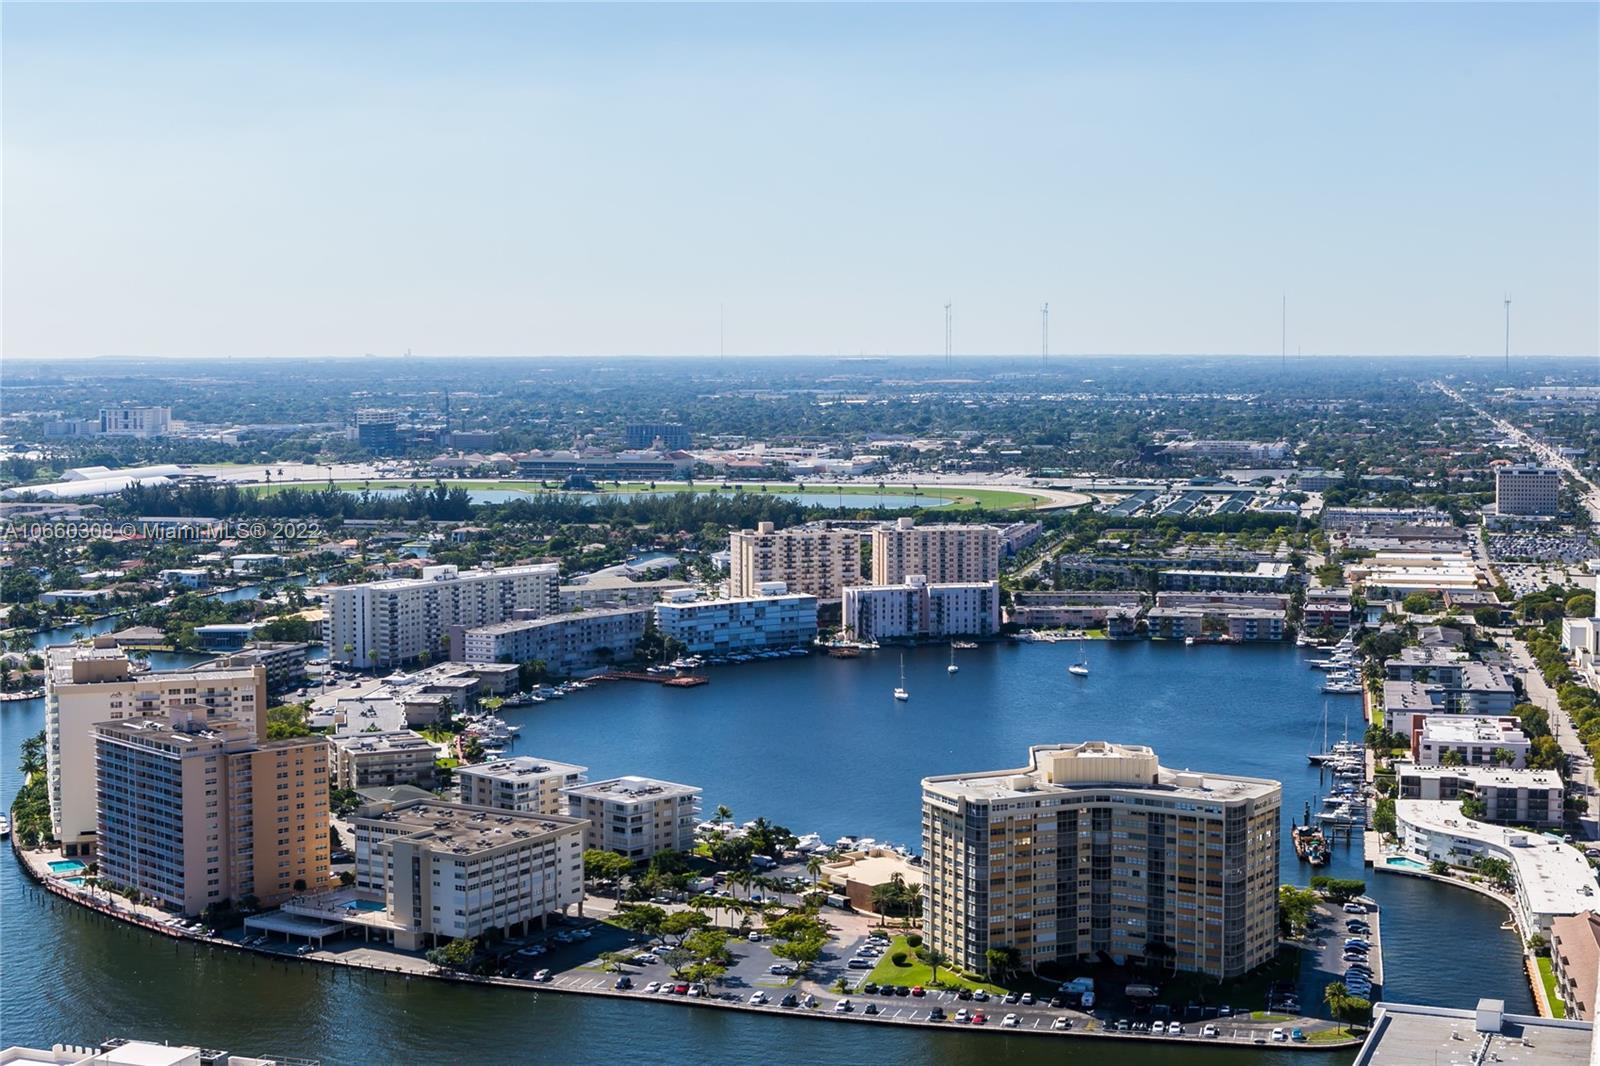 4705 1 / 1 811 sq. ft. $ 2020-09-25 0 Photo